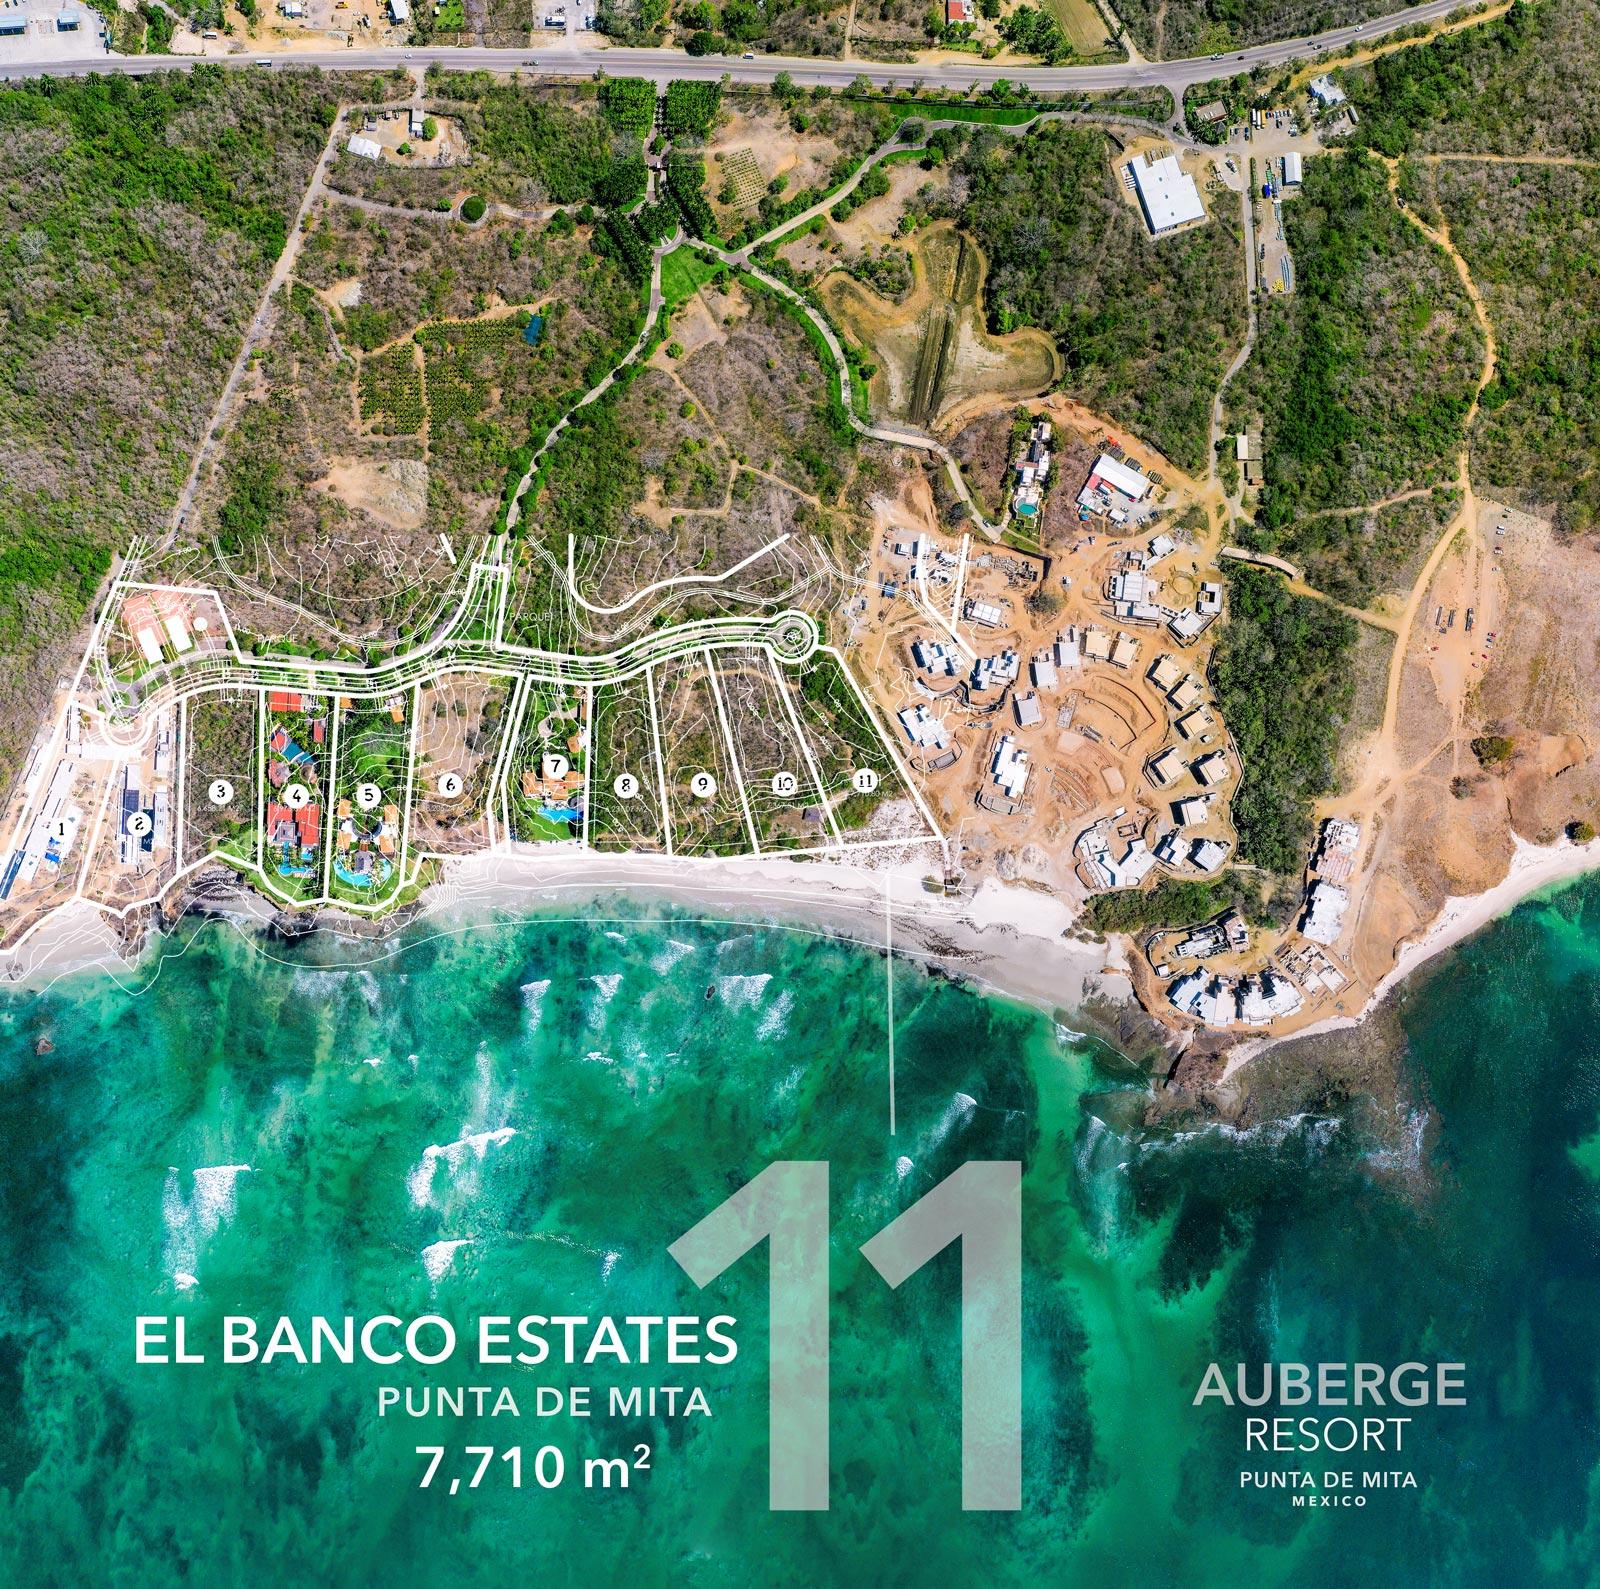 El Banco Estates - Lot 11 - Auberge Resort - Ultra luxury resort real estate - Home site building lots for sale near the Punta Mita Resort, Riviera Nayarit, Mexico